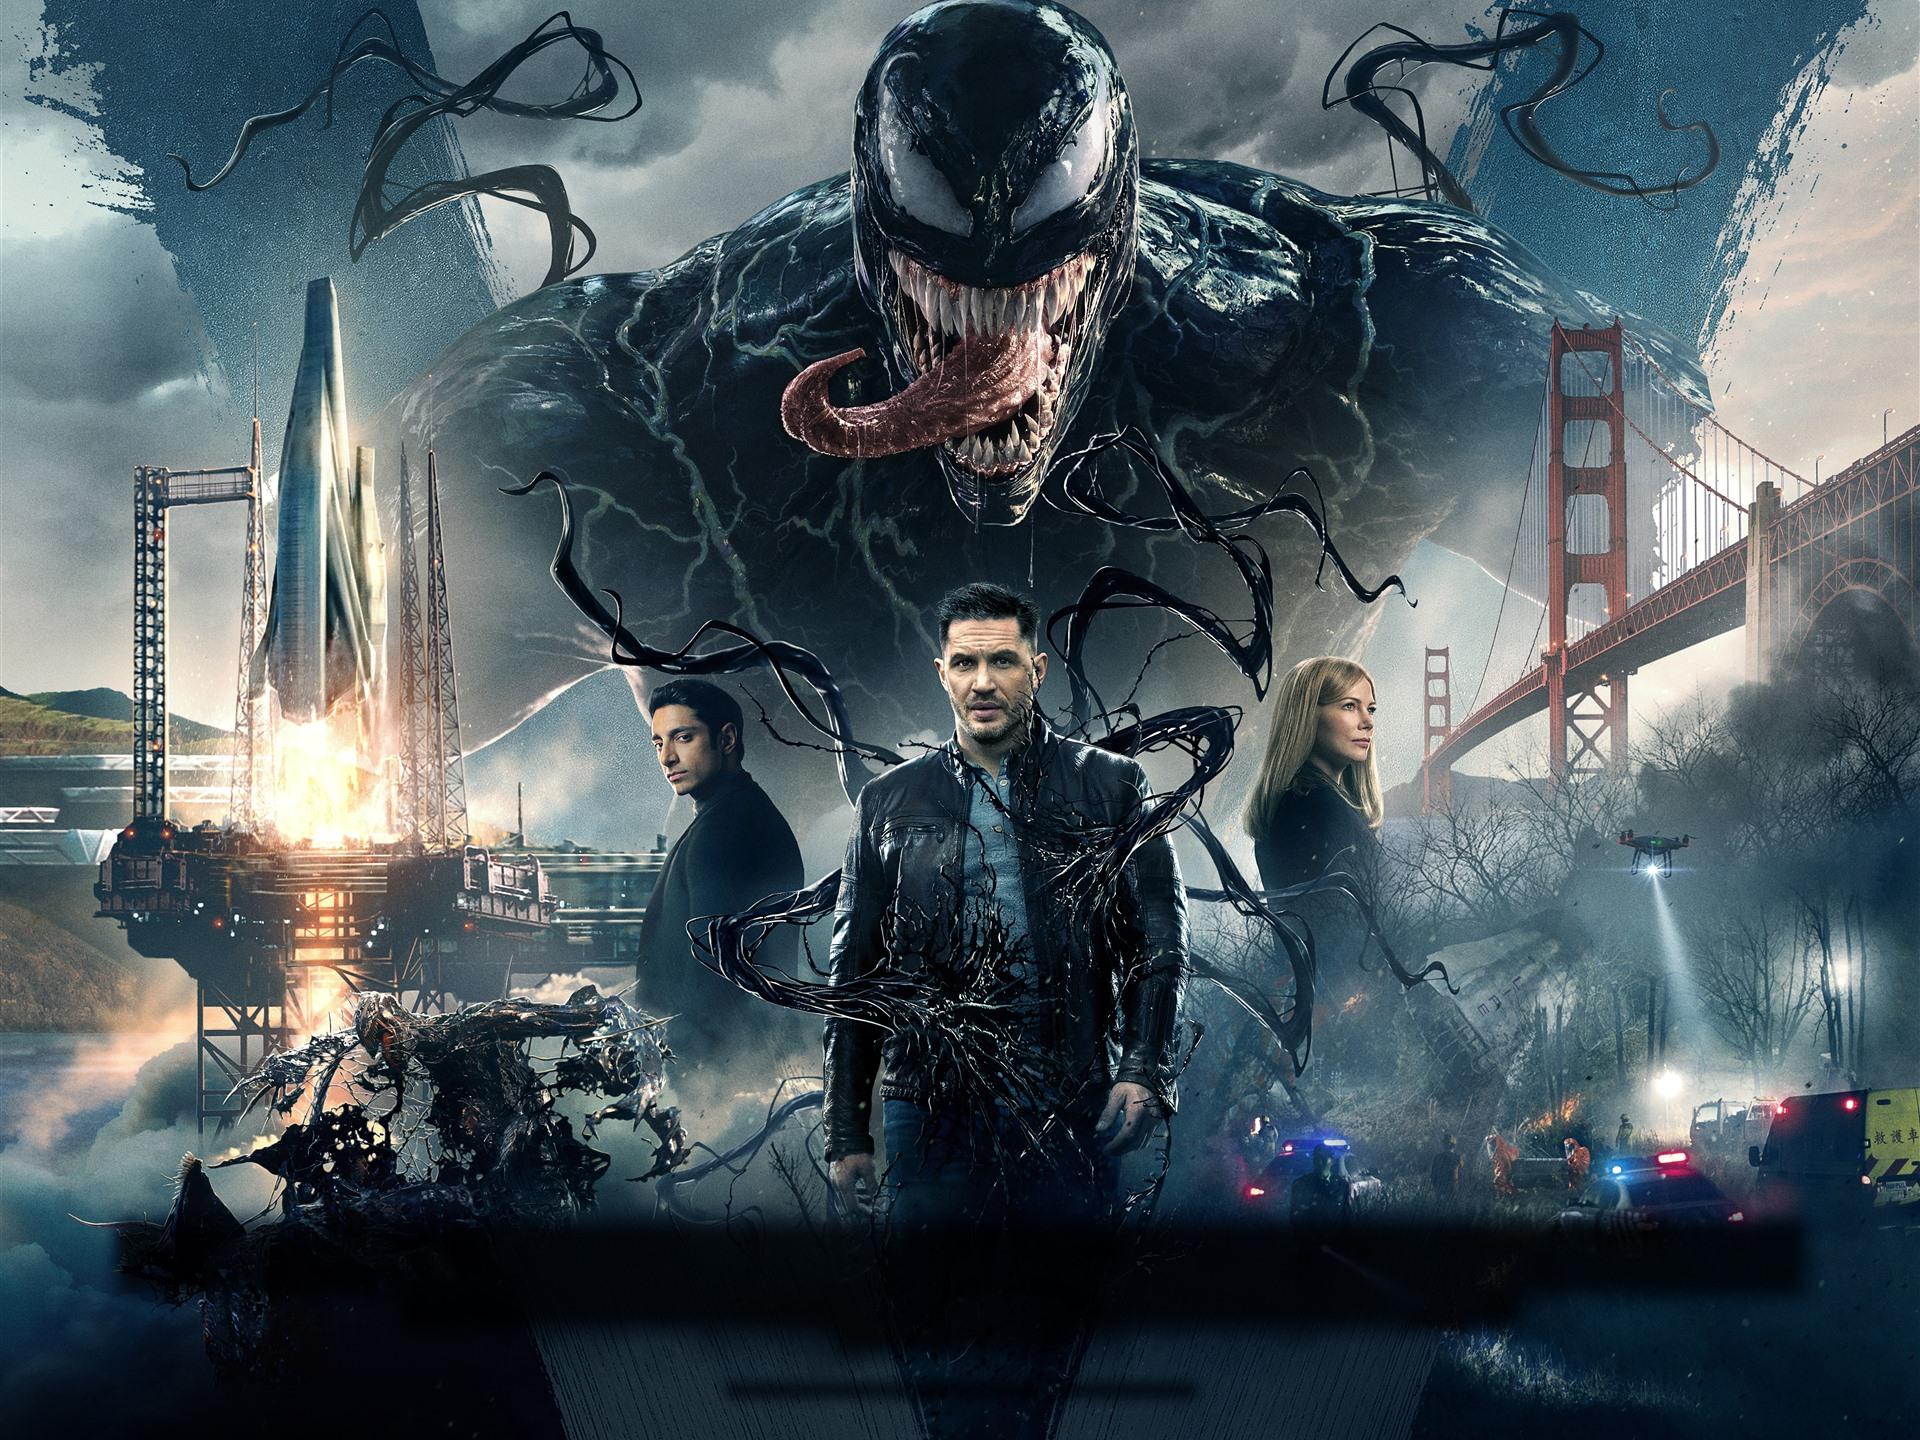 Movie Poster 2019: Venom 2018 Movie 1242x2688 IPhone XS Max Wallpaper